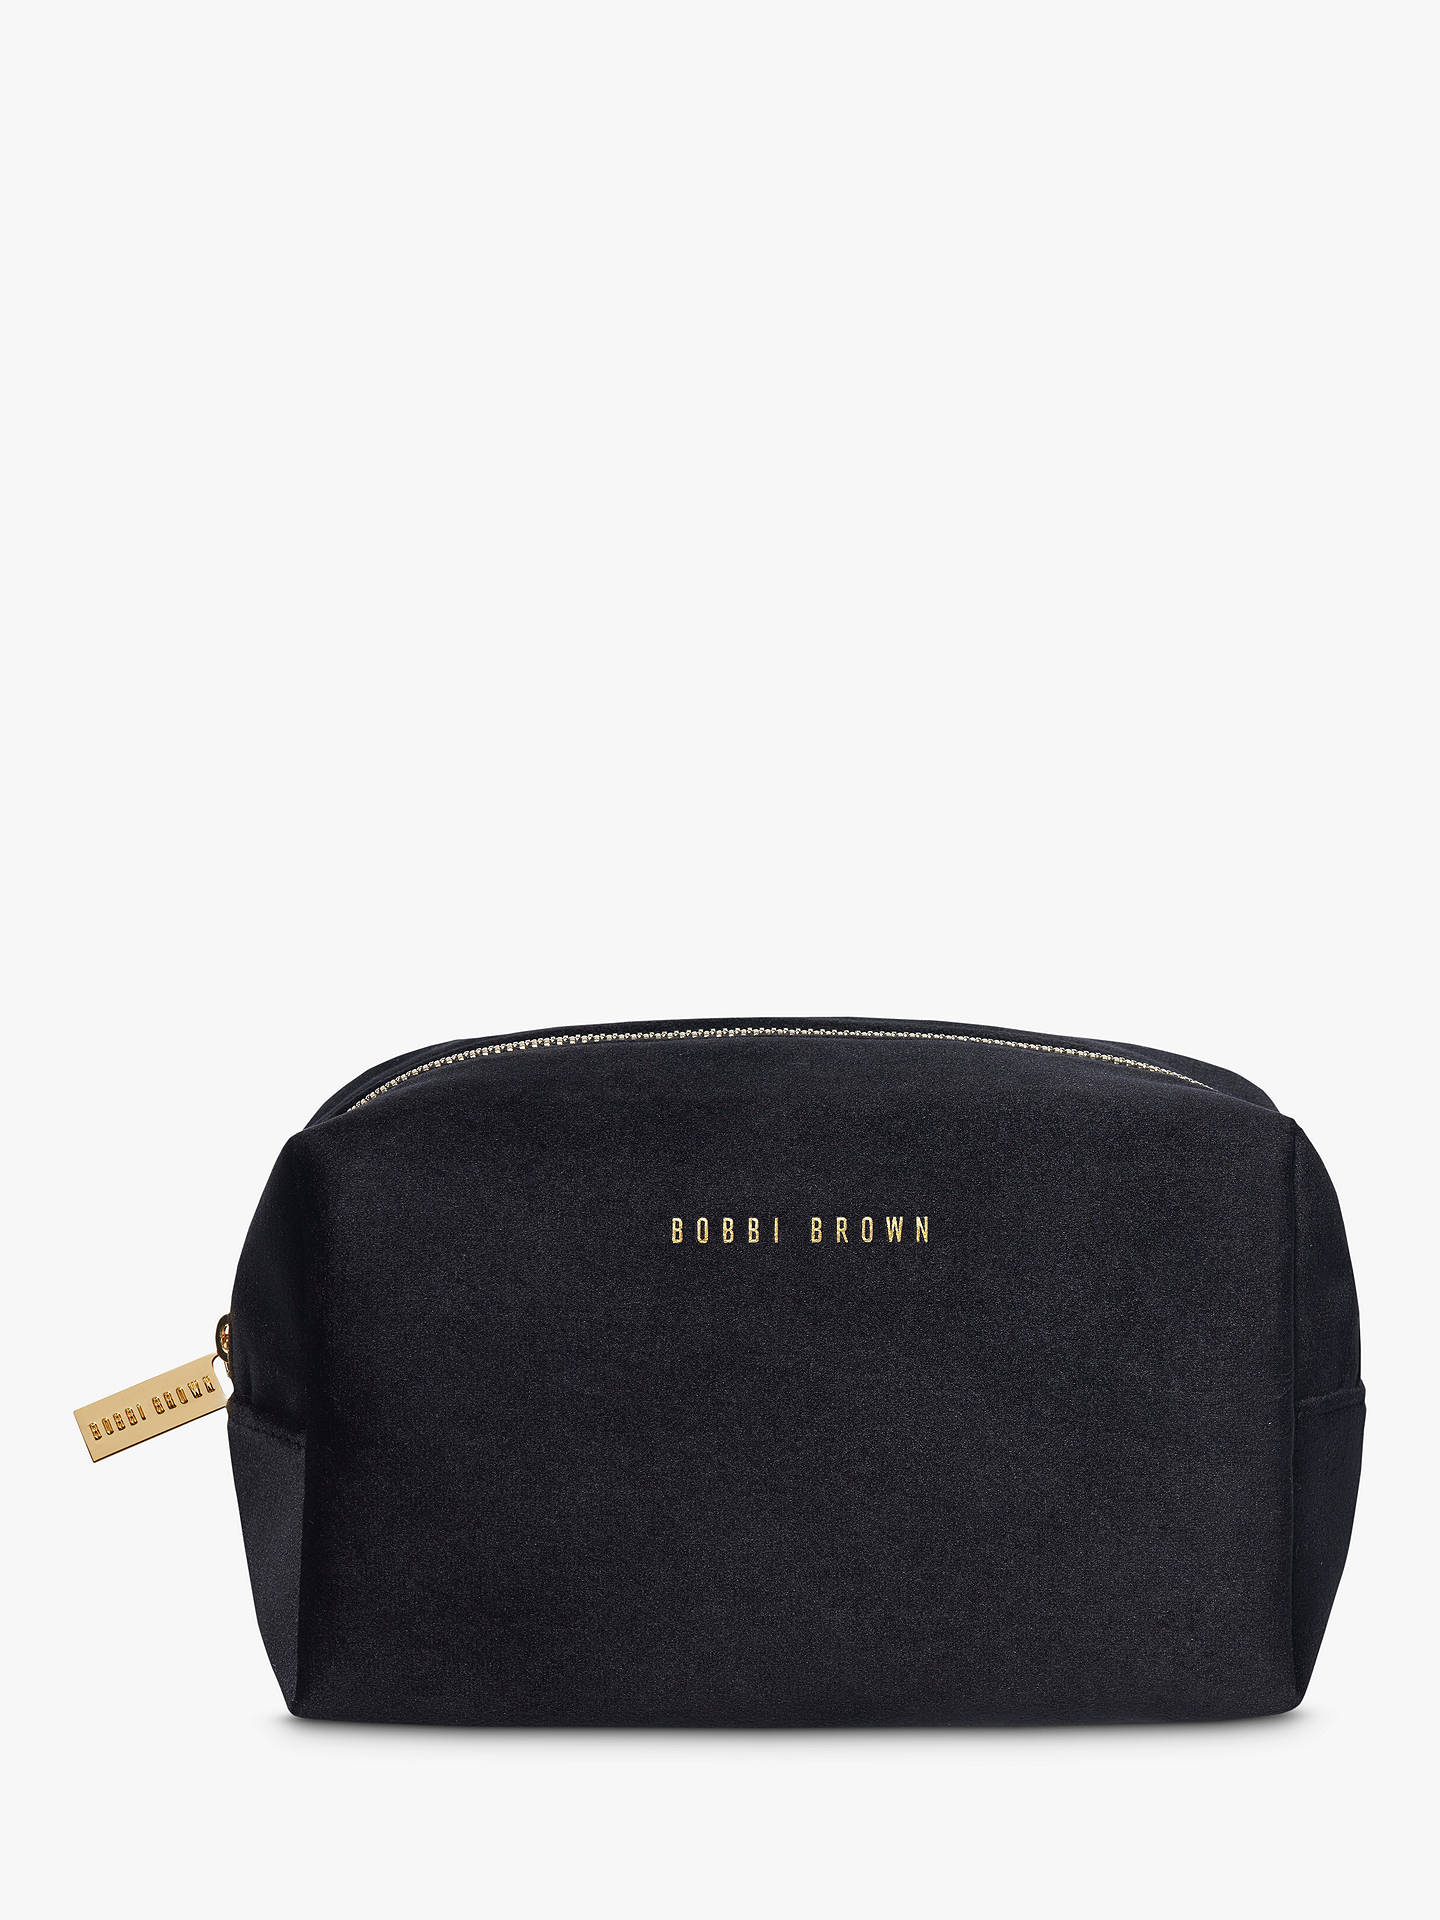 Bobbi Brown Velvet Makeup Bag Black